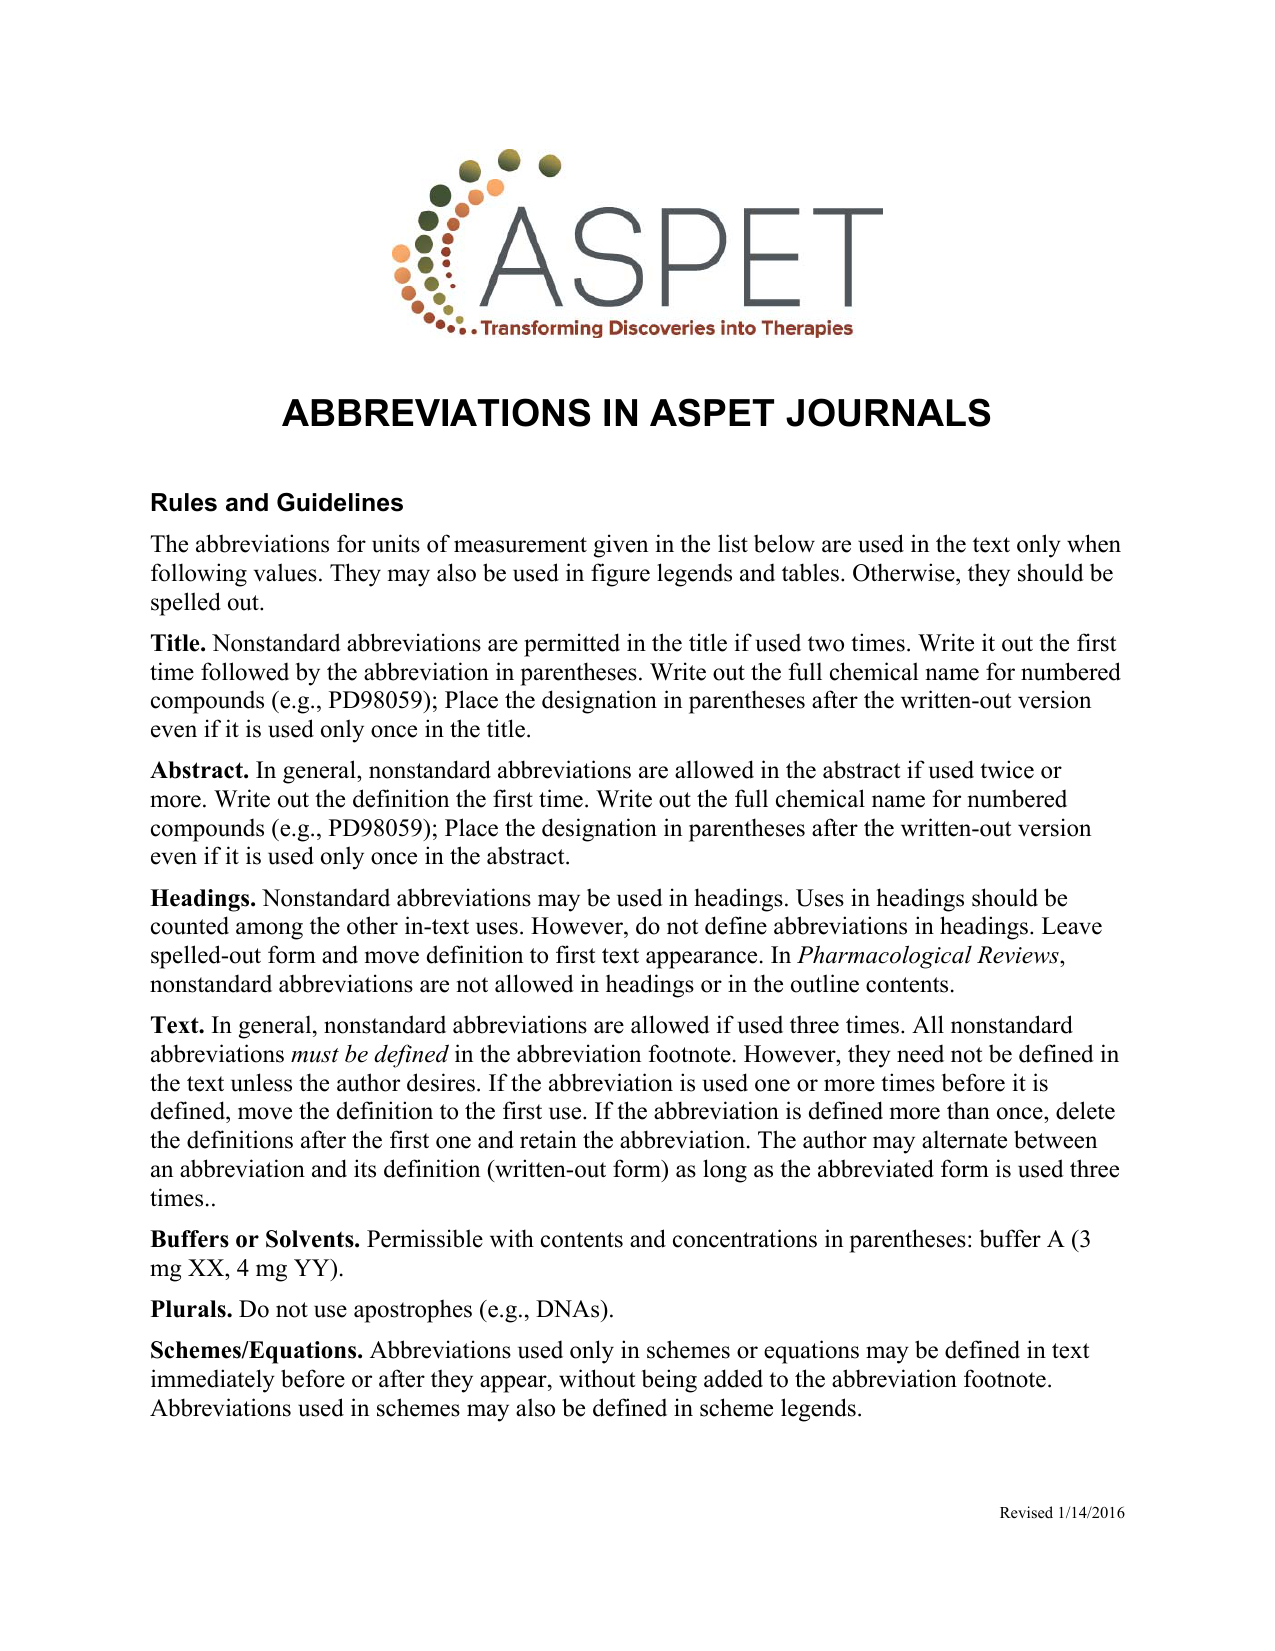 ABBREVIATIONS IN ASPET JOURNALS